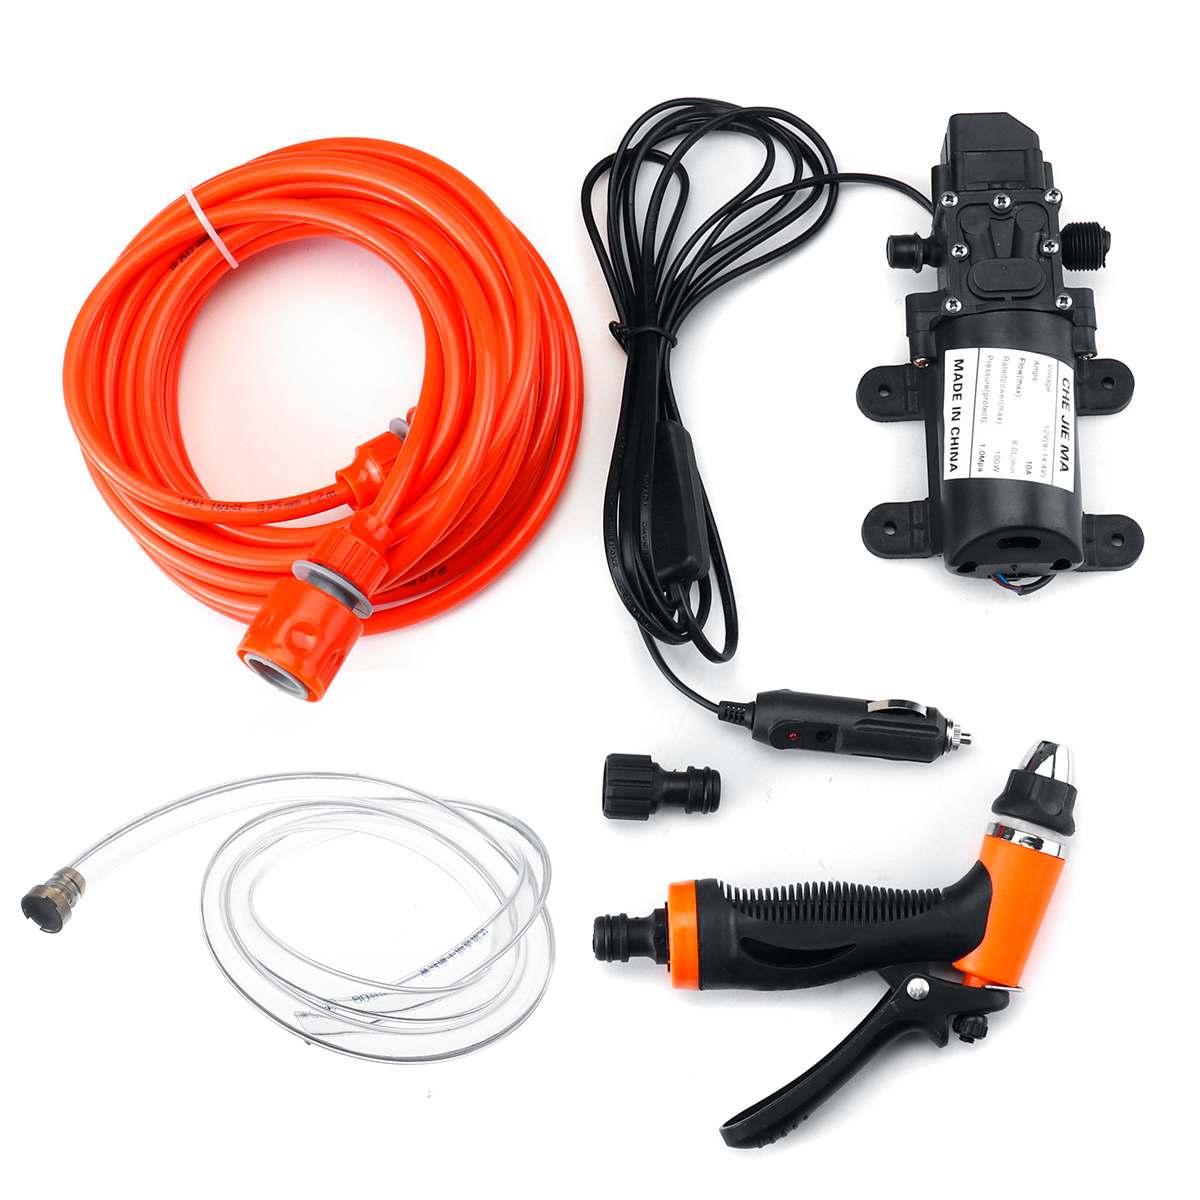 12V 100W 160PSI High Pressure Self-priming Electric Car Wash Pump Portable Washing Machine Cigarette Lighter Water Pump Set